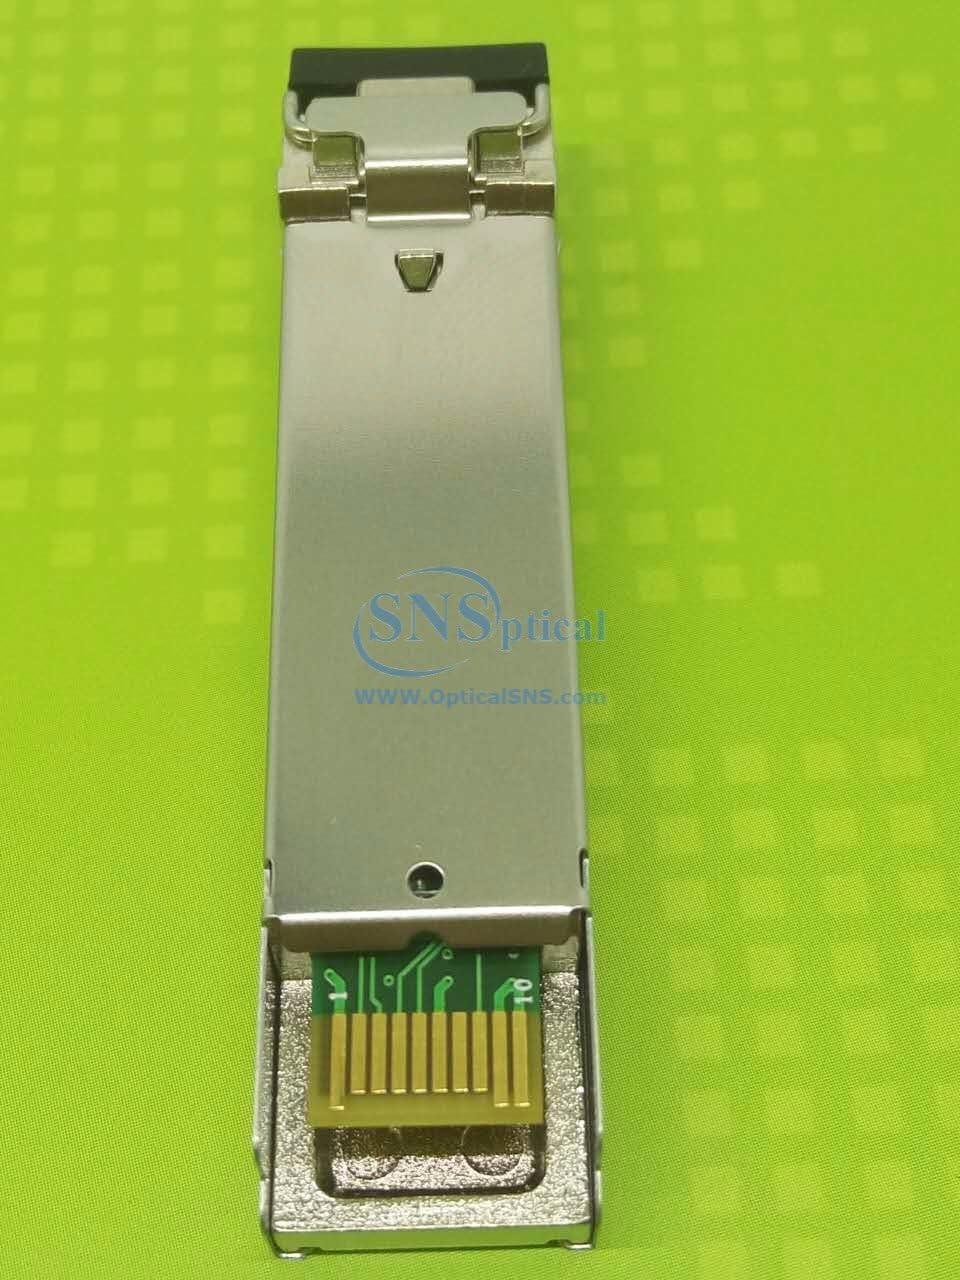 SnS E1MG-100FX-LR Compatible with E1MG-100FX-LR 155M//OC3 SFP 40km SMF Transceiver Module